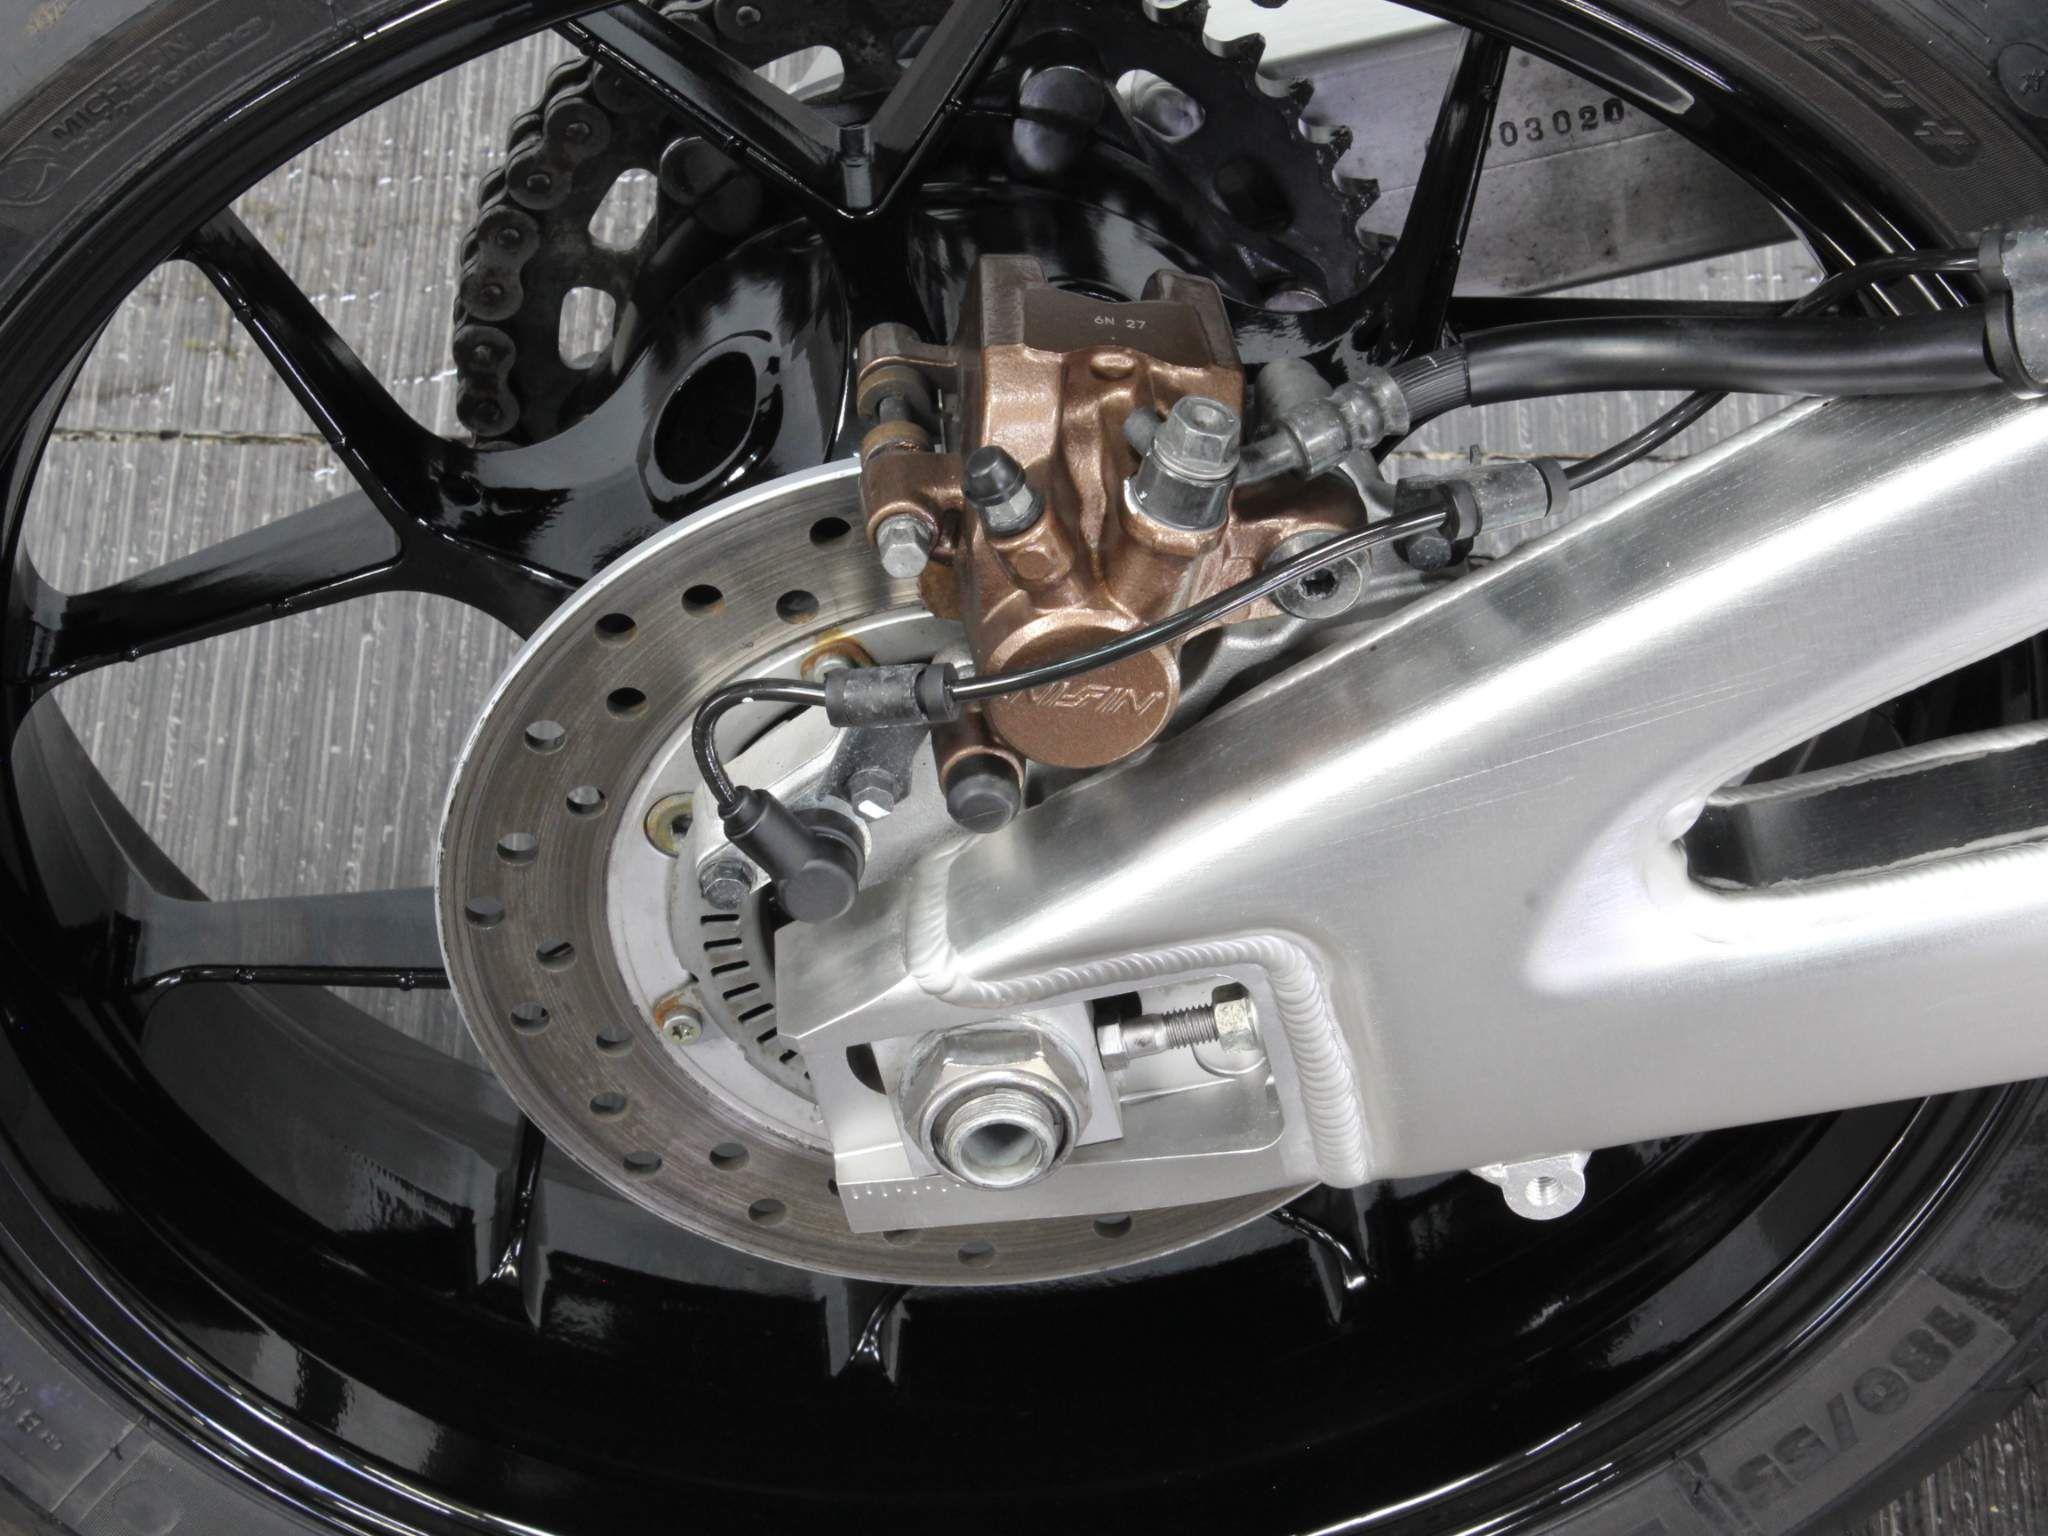 Honda CBR600RR Images